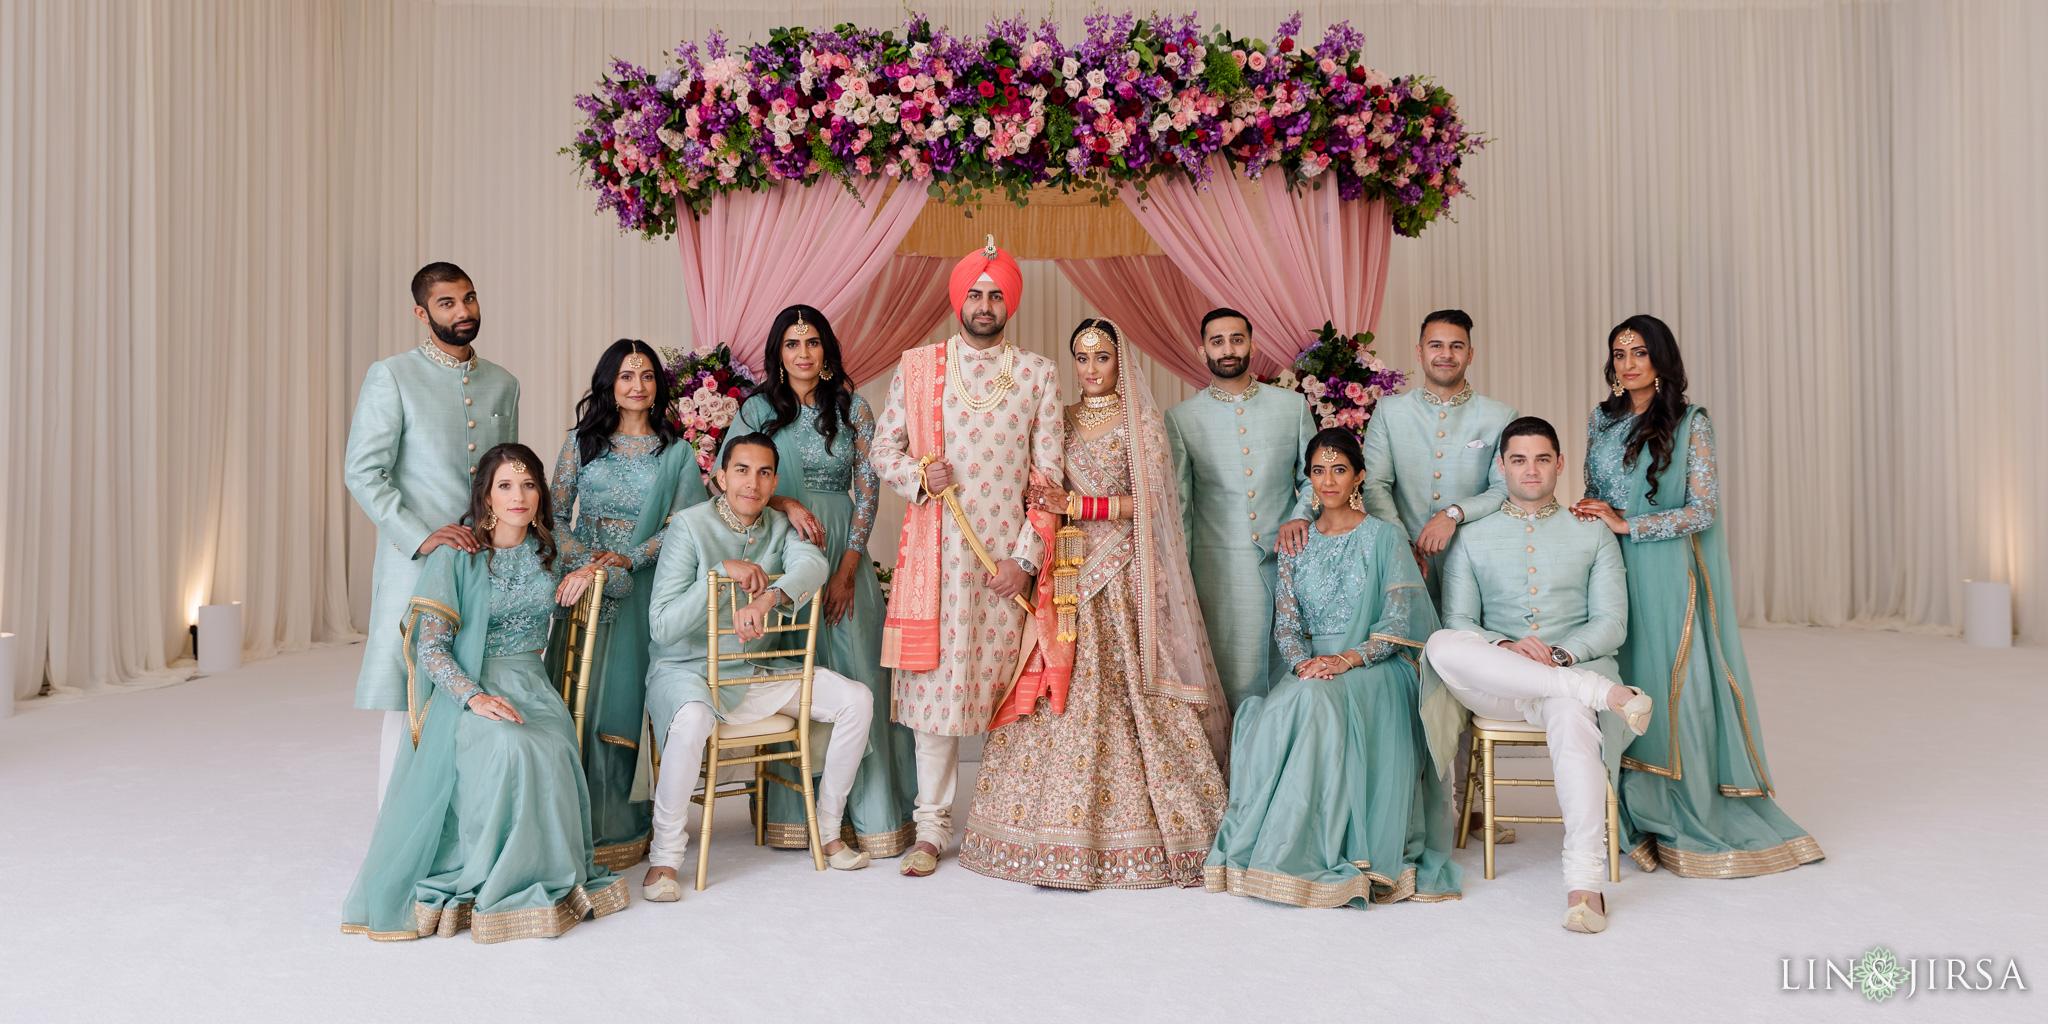 42 Hilton Santa Barbara Beachfront Resort Punjabi Indian Wedding Party Photography